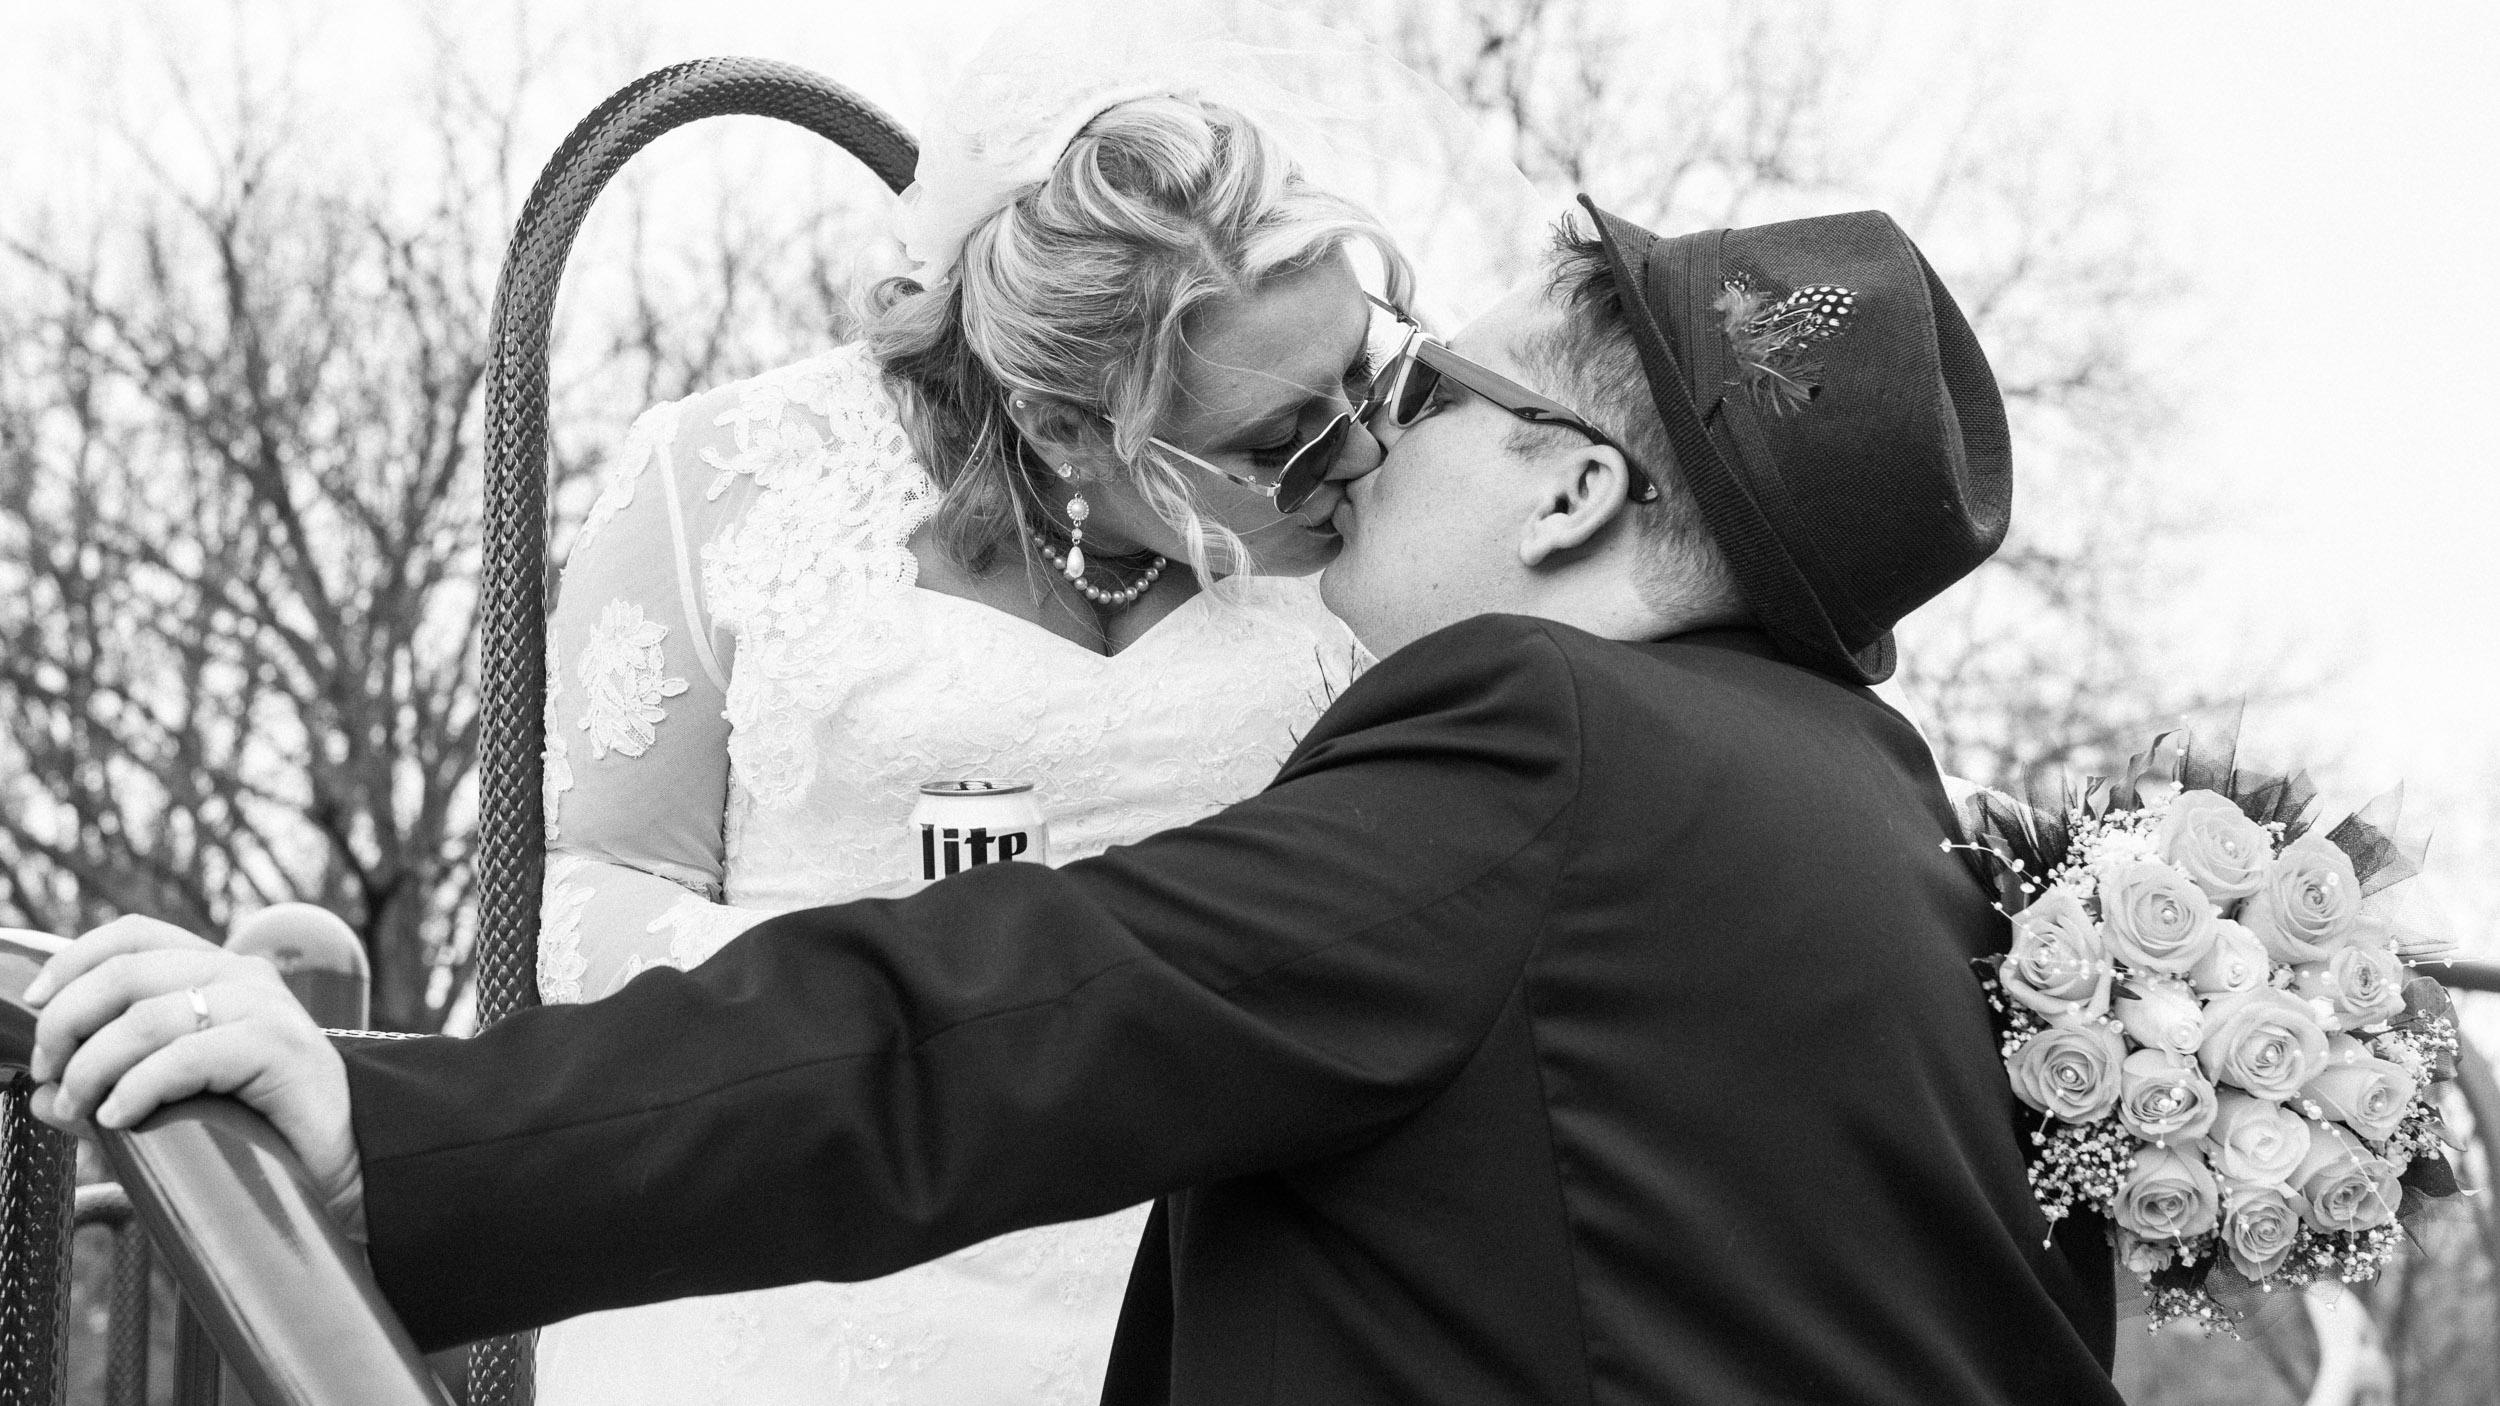 Bride-and-Groom-on-Playground-kissing-4.jpg